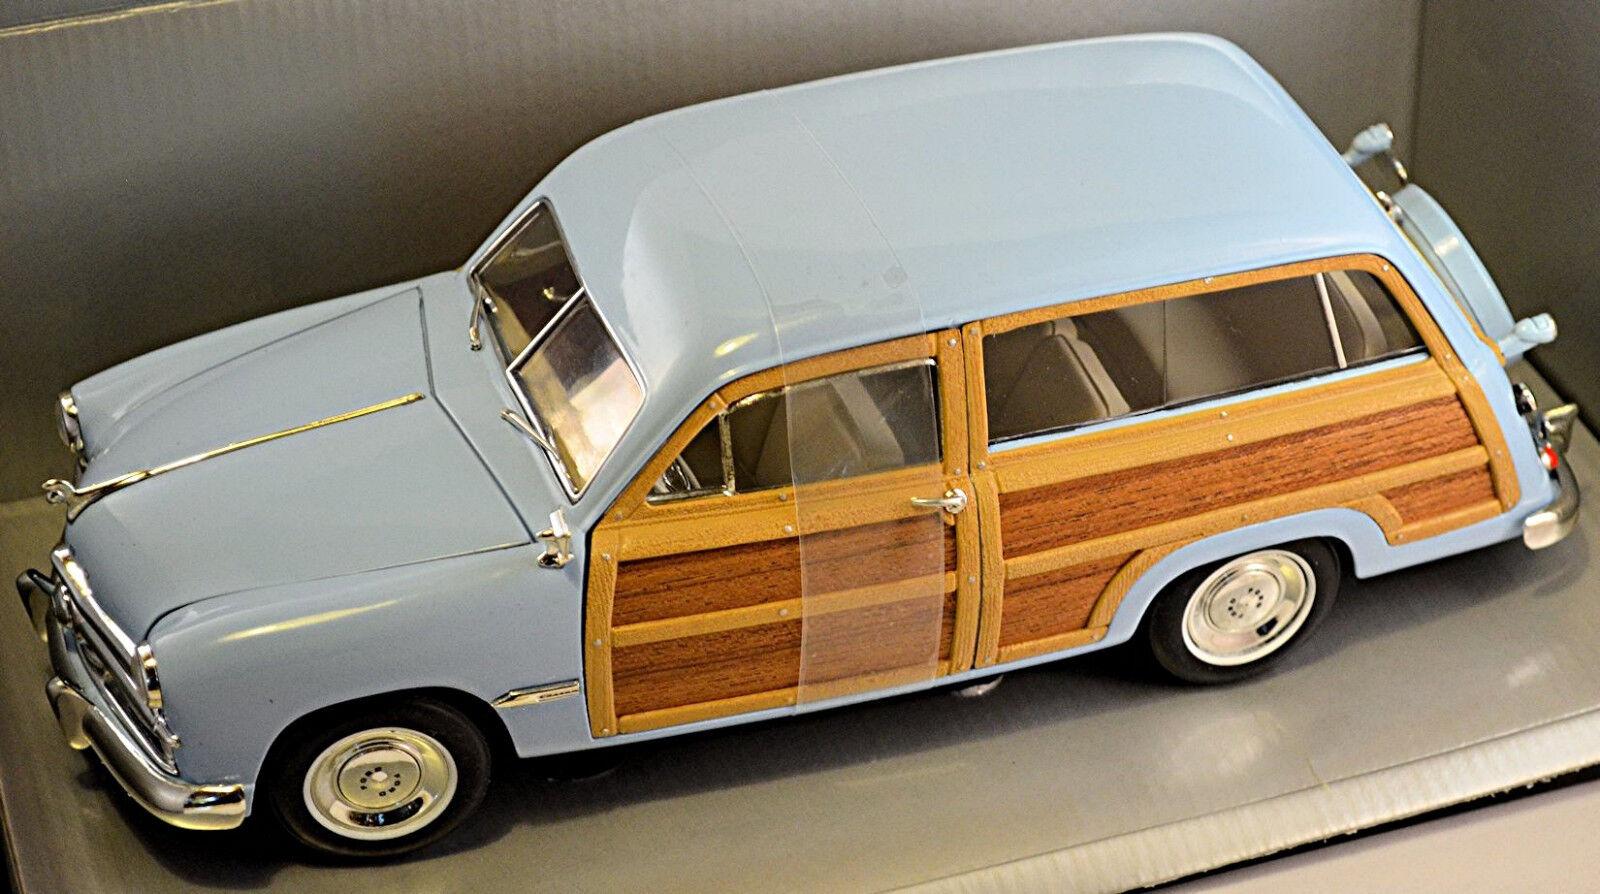 Ford Woody Wagon 1949 hellblau light-Blau 1 18 Motor City Classics  | Verrückter Preis